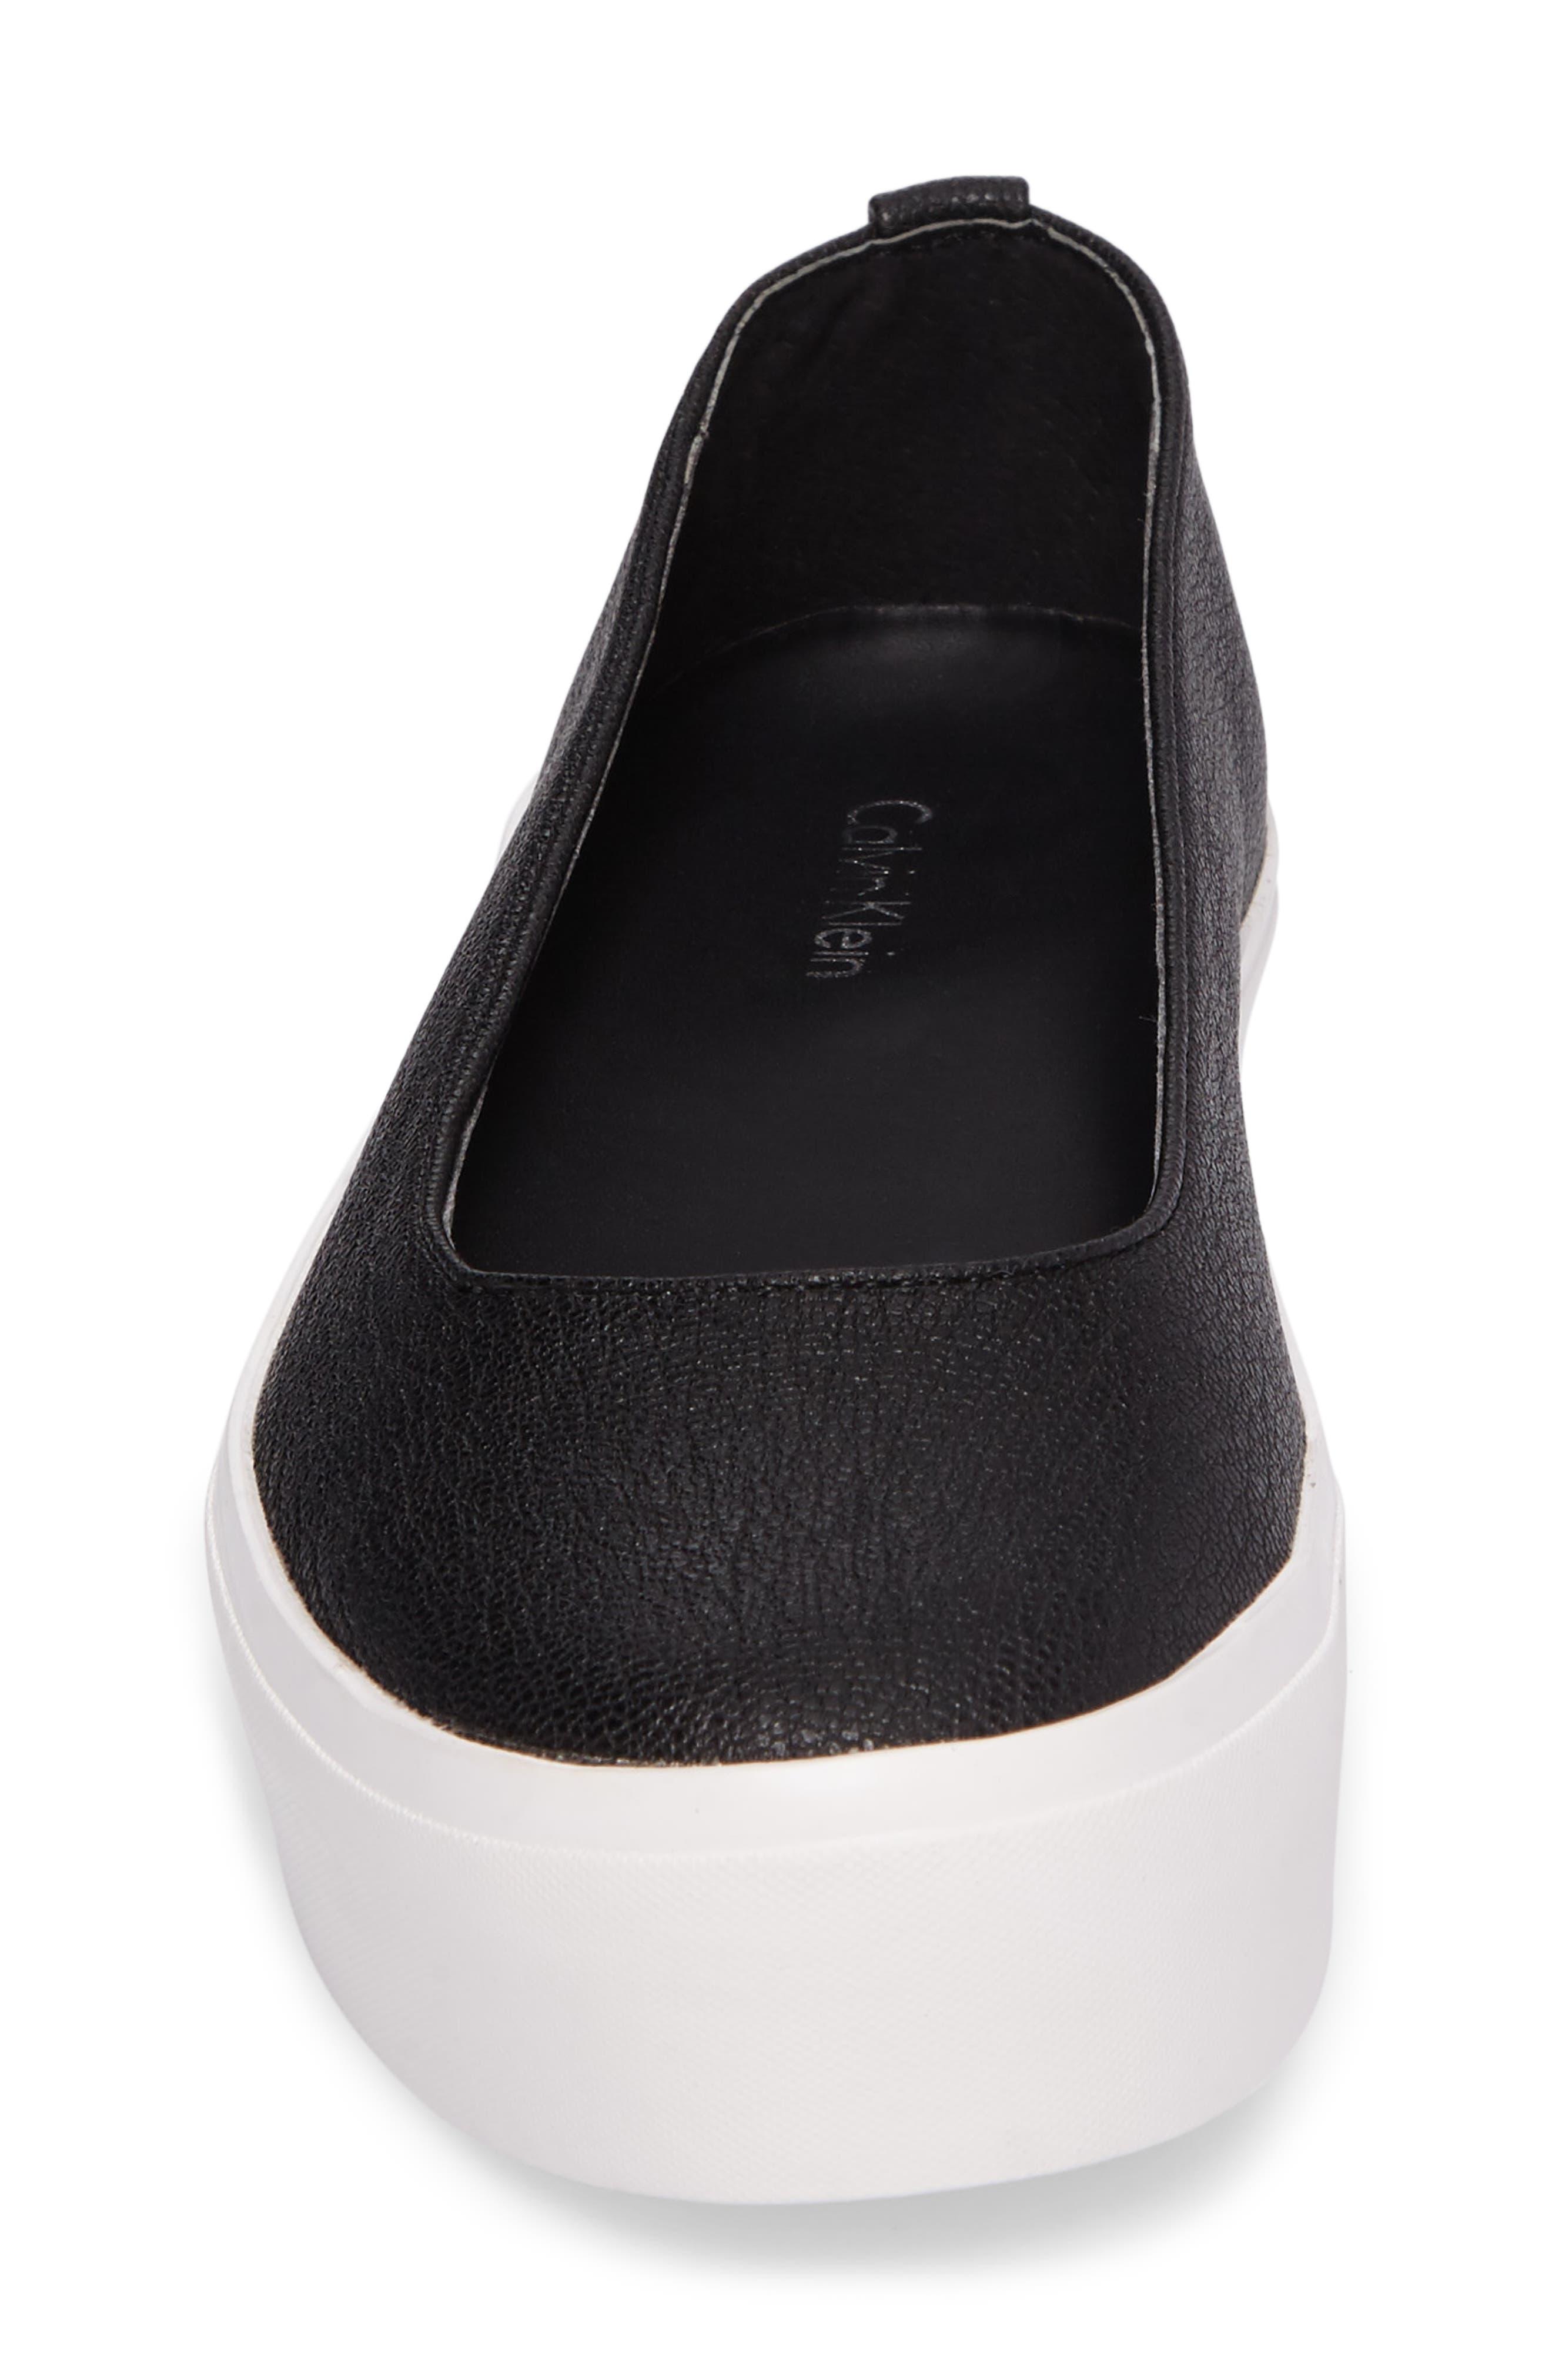 Janie Platform Flat,                             Alternate thumbnail 4, color,                             Black Pebble Leather